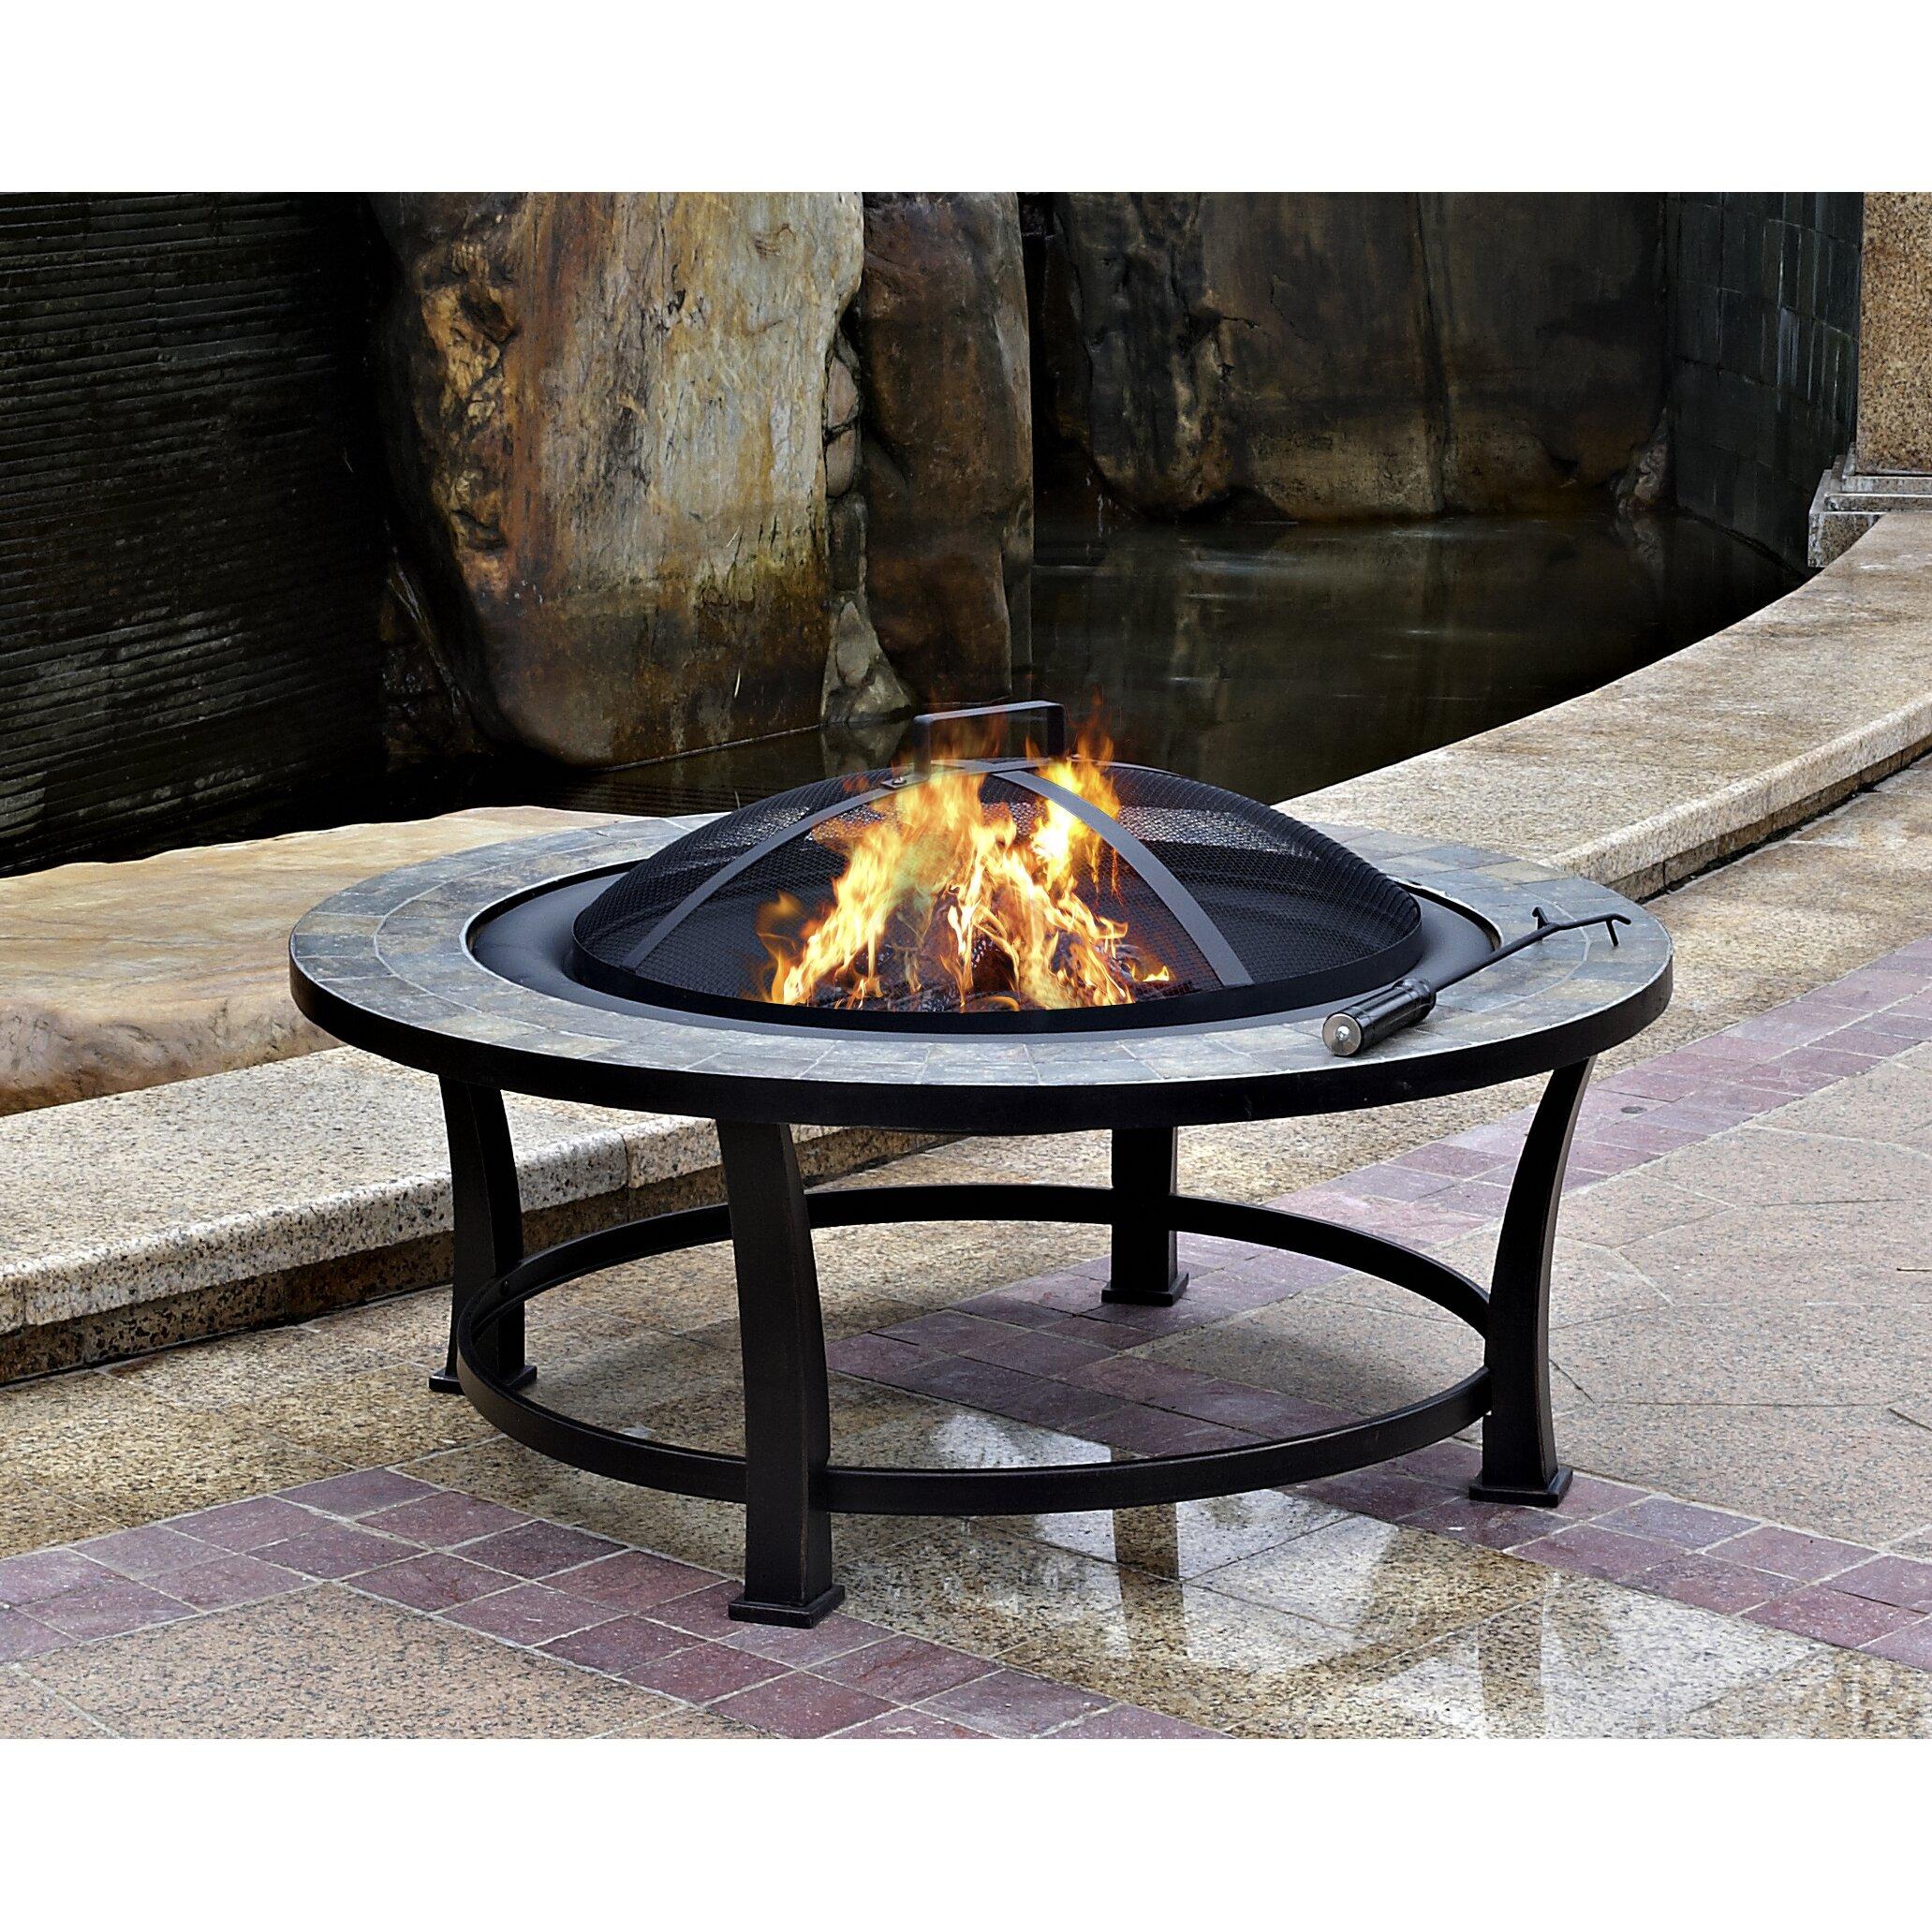 Az Patio Heaters Wood Burning Fire Pit Amp Reviews Wayfair